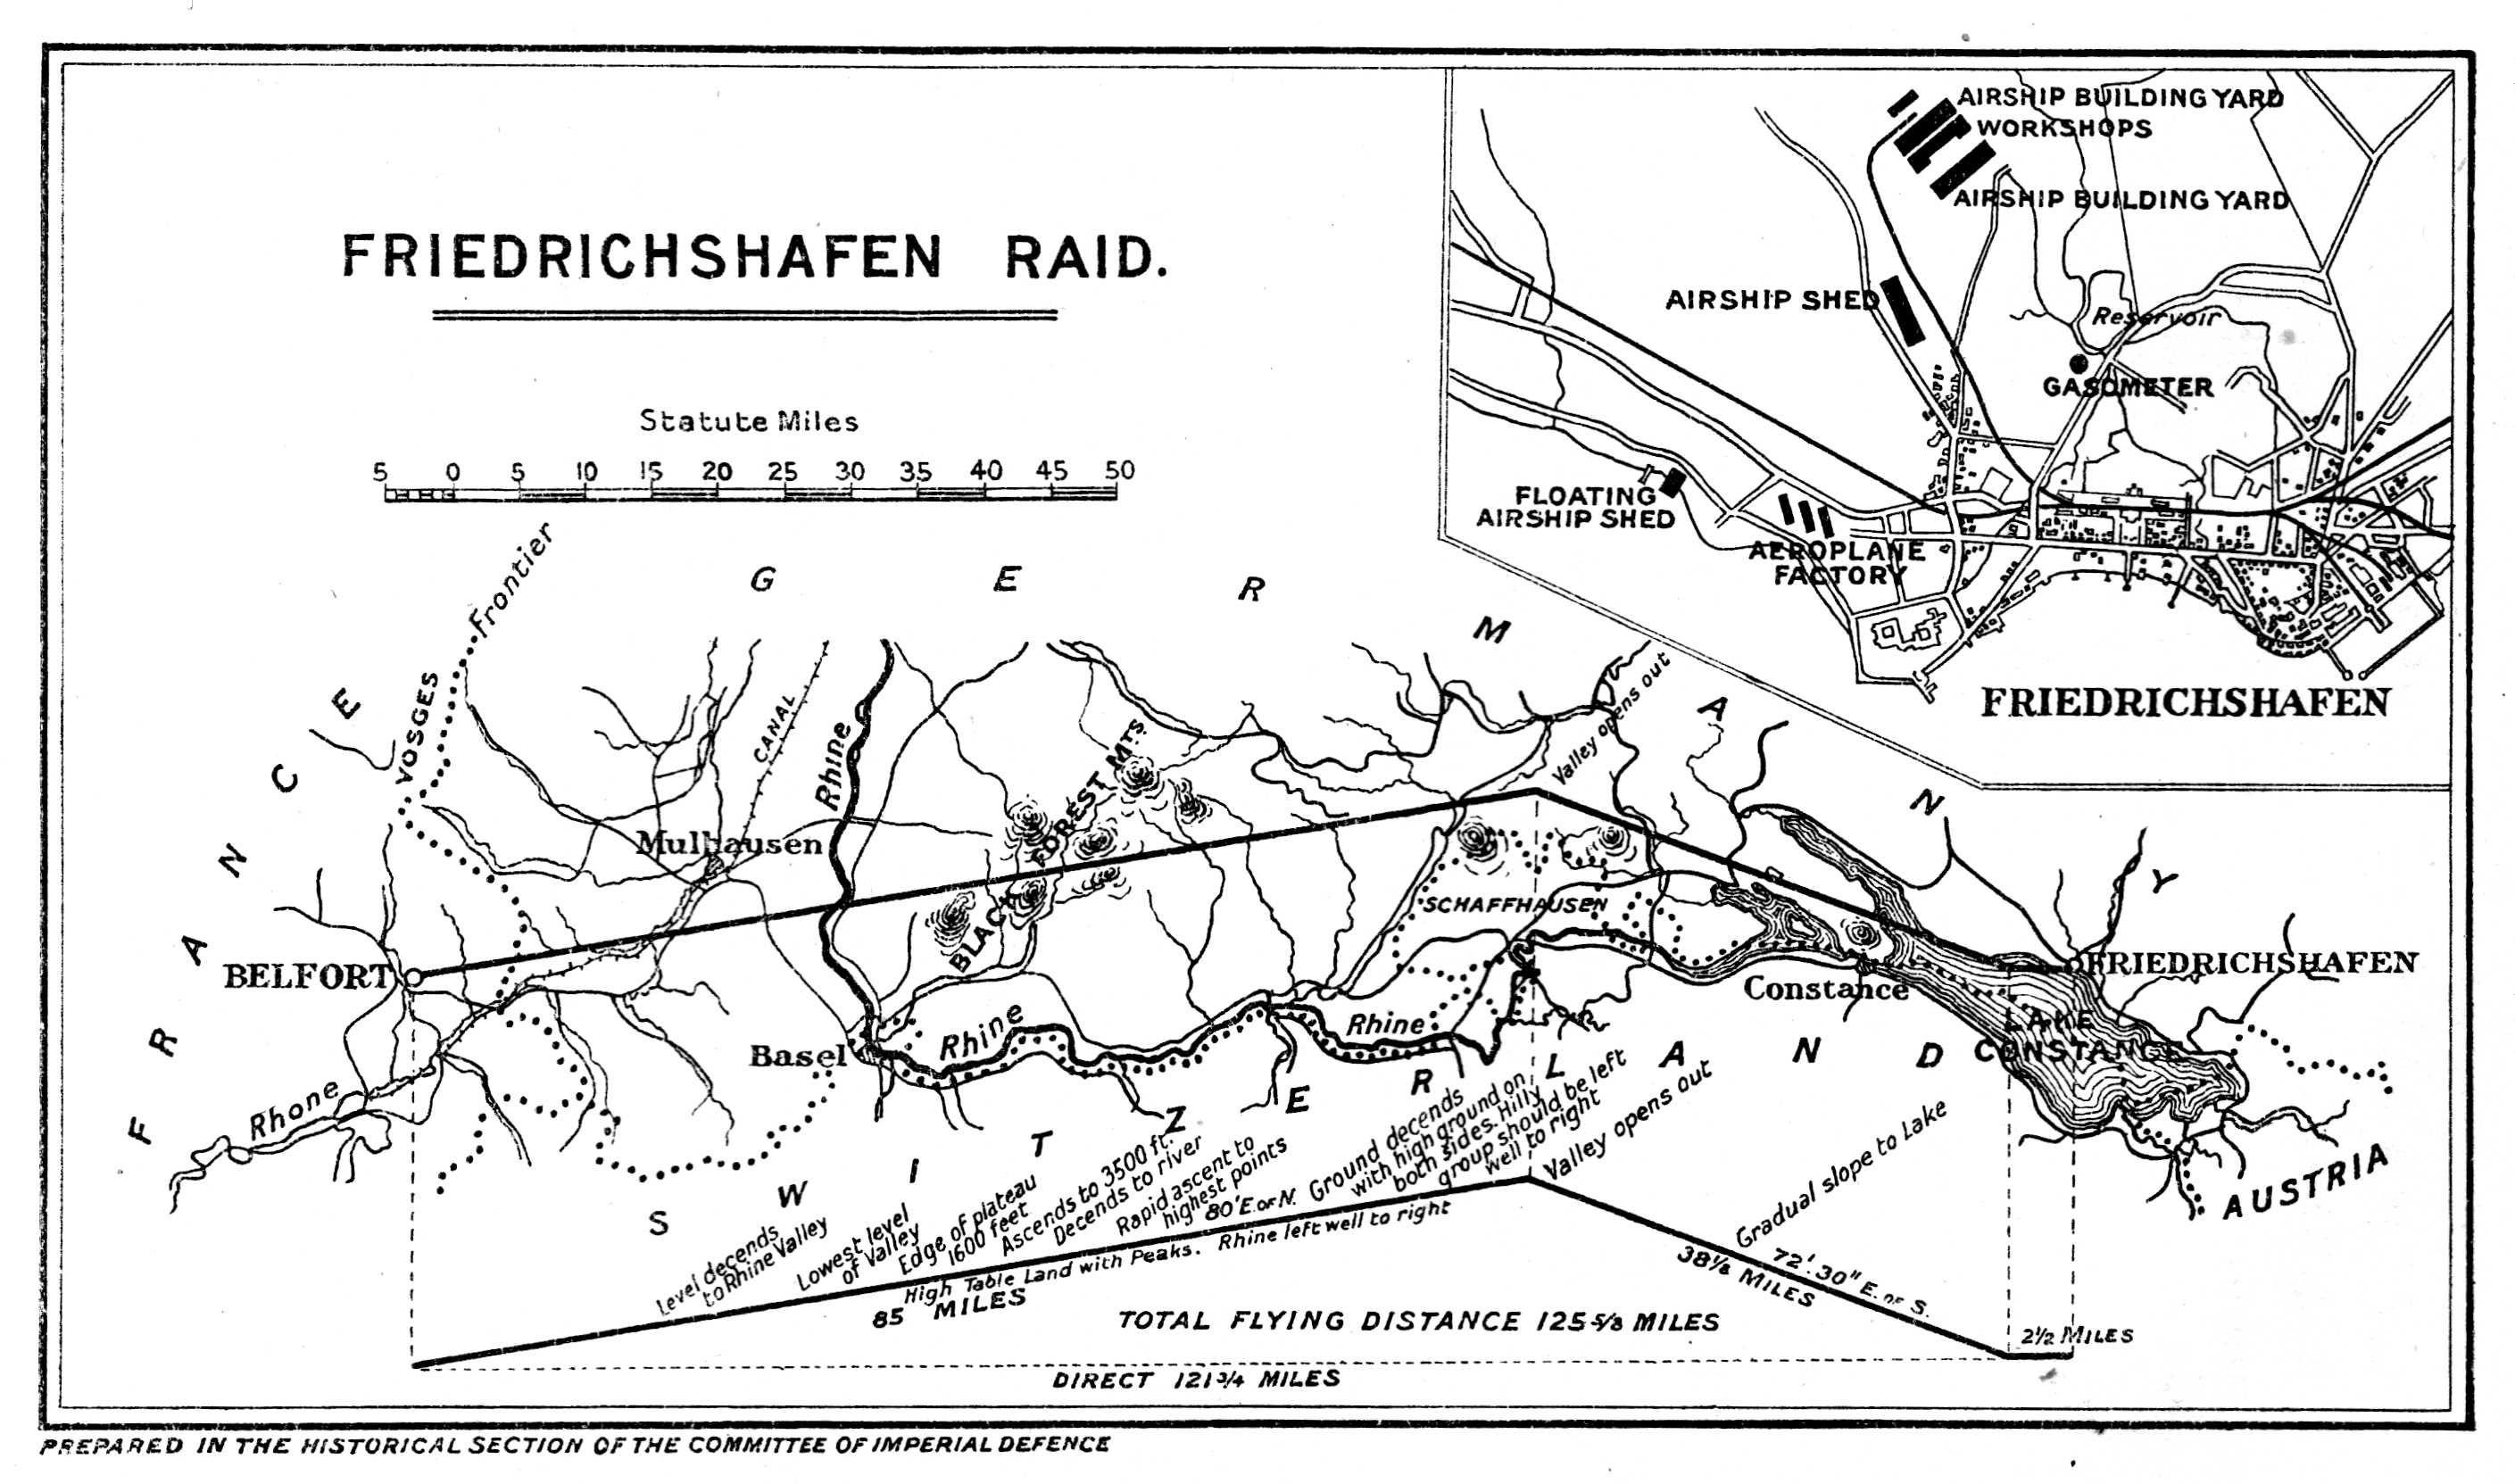 Operational plan of the Freidrichshafen raid today